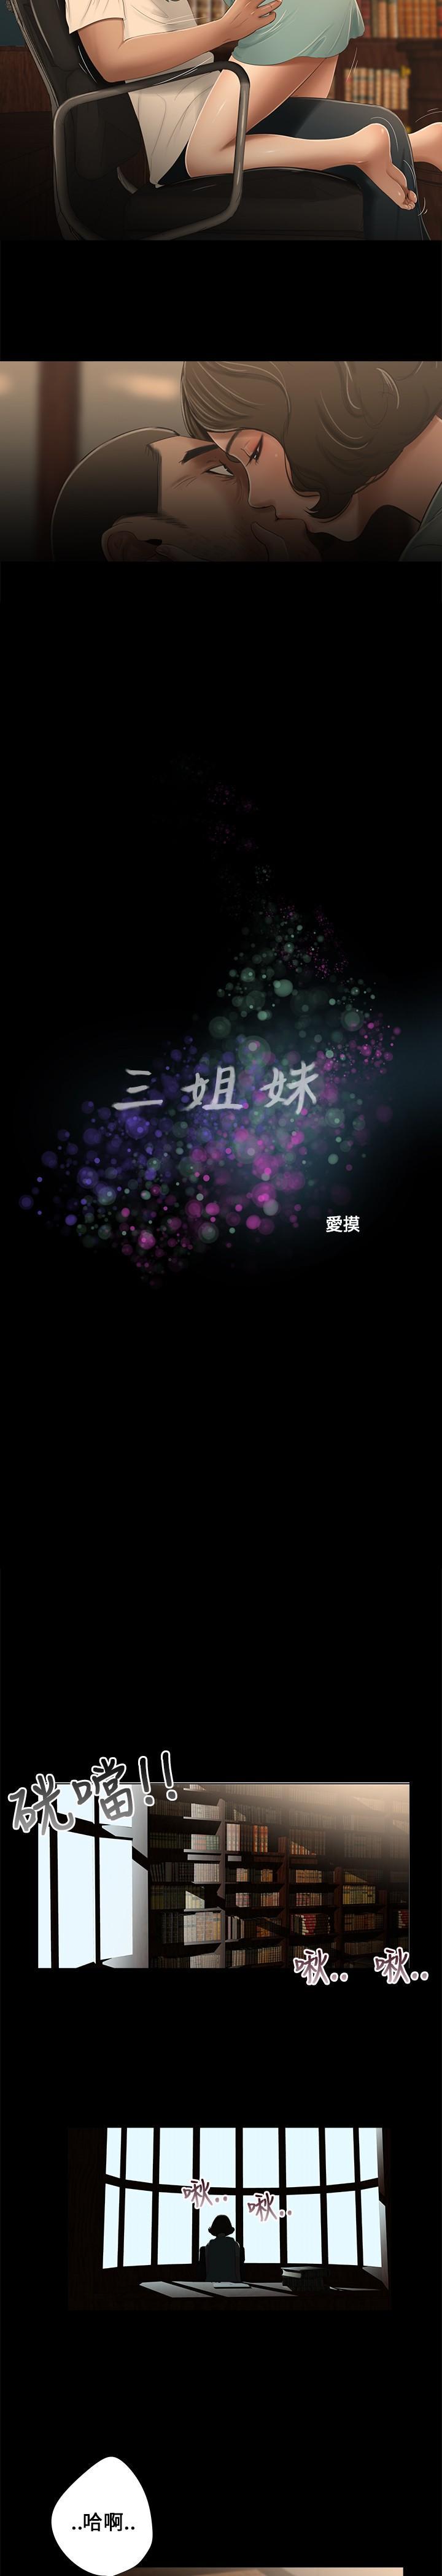 Three sisters 三姐妹Ch.13~19 (Chinese)中文 66